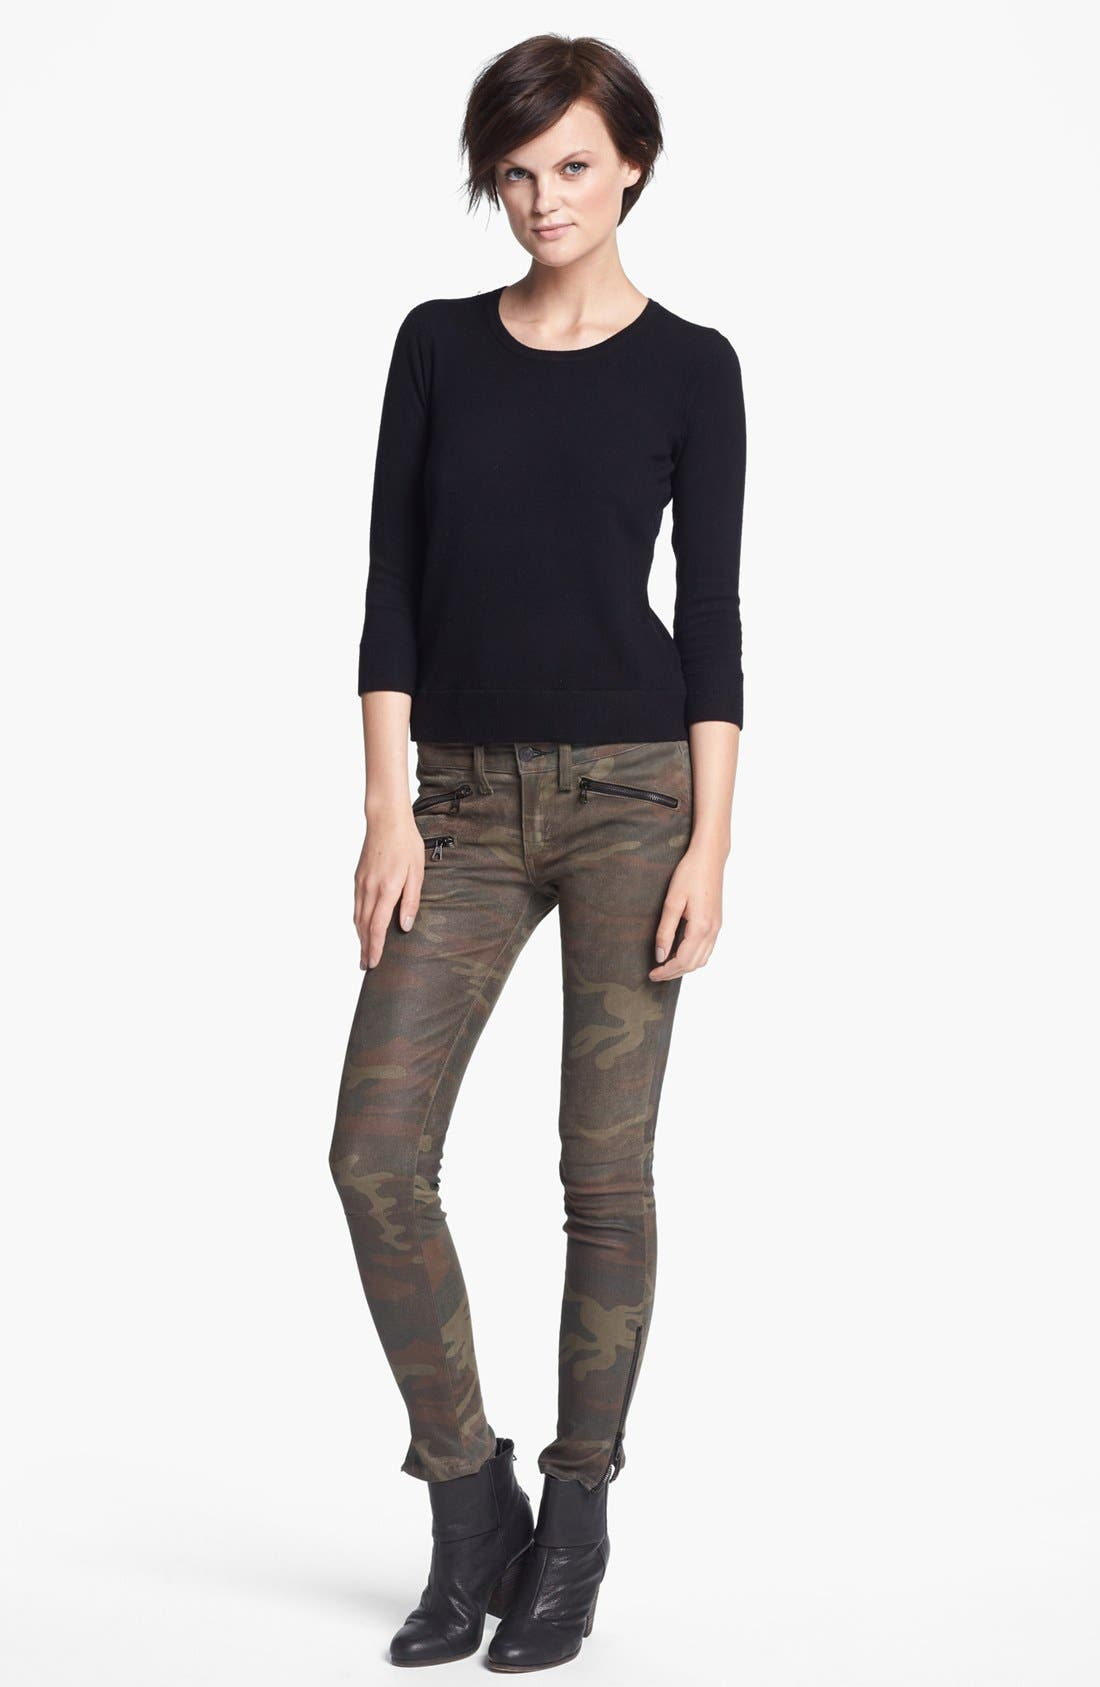 Main Image - rag & bone/JEAN 'Natalie' Crewneck Sweater